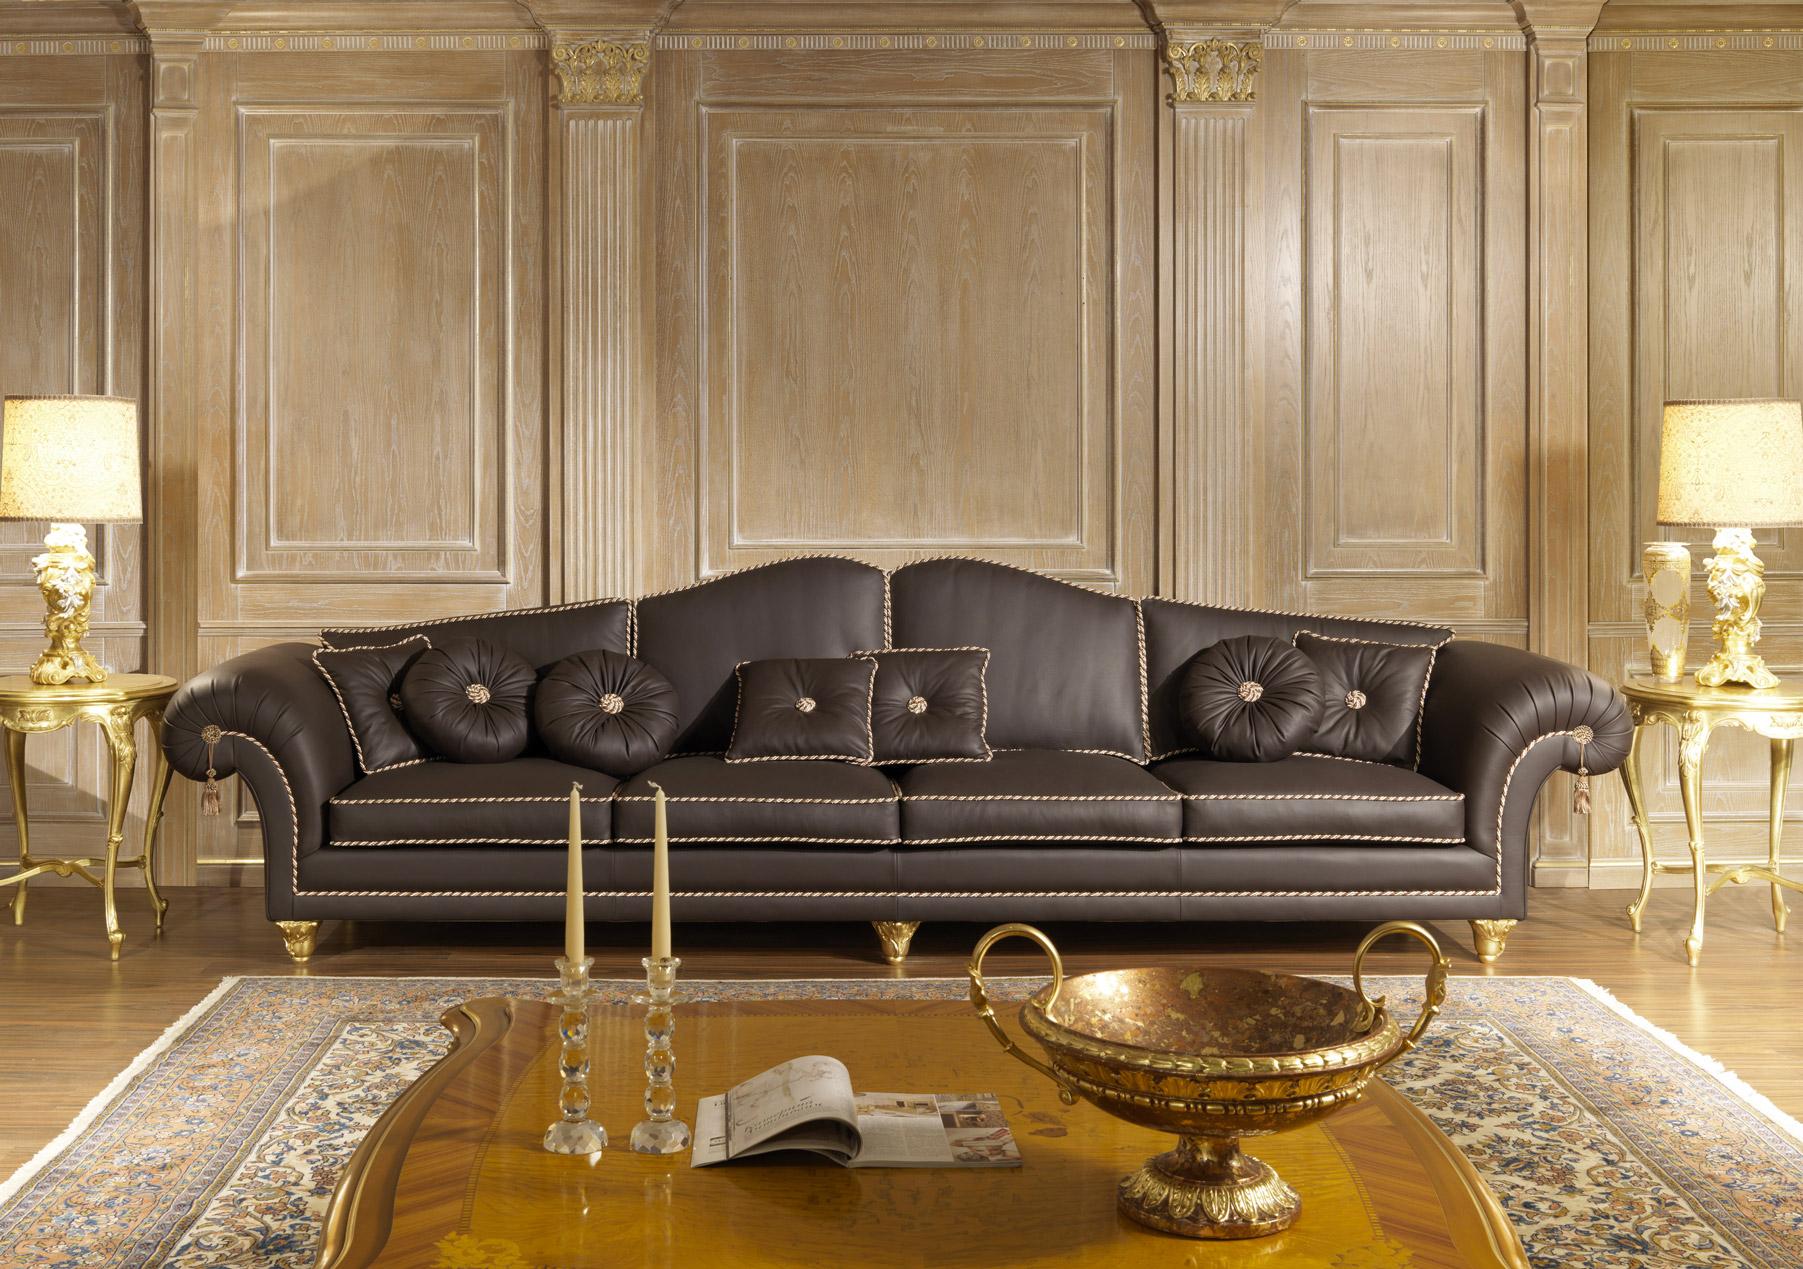 Extra Large Sofa In Leather Vimercati Classic Furniture